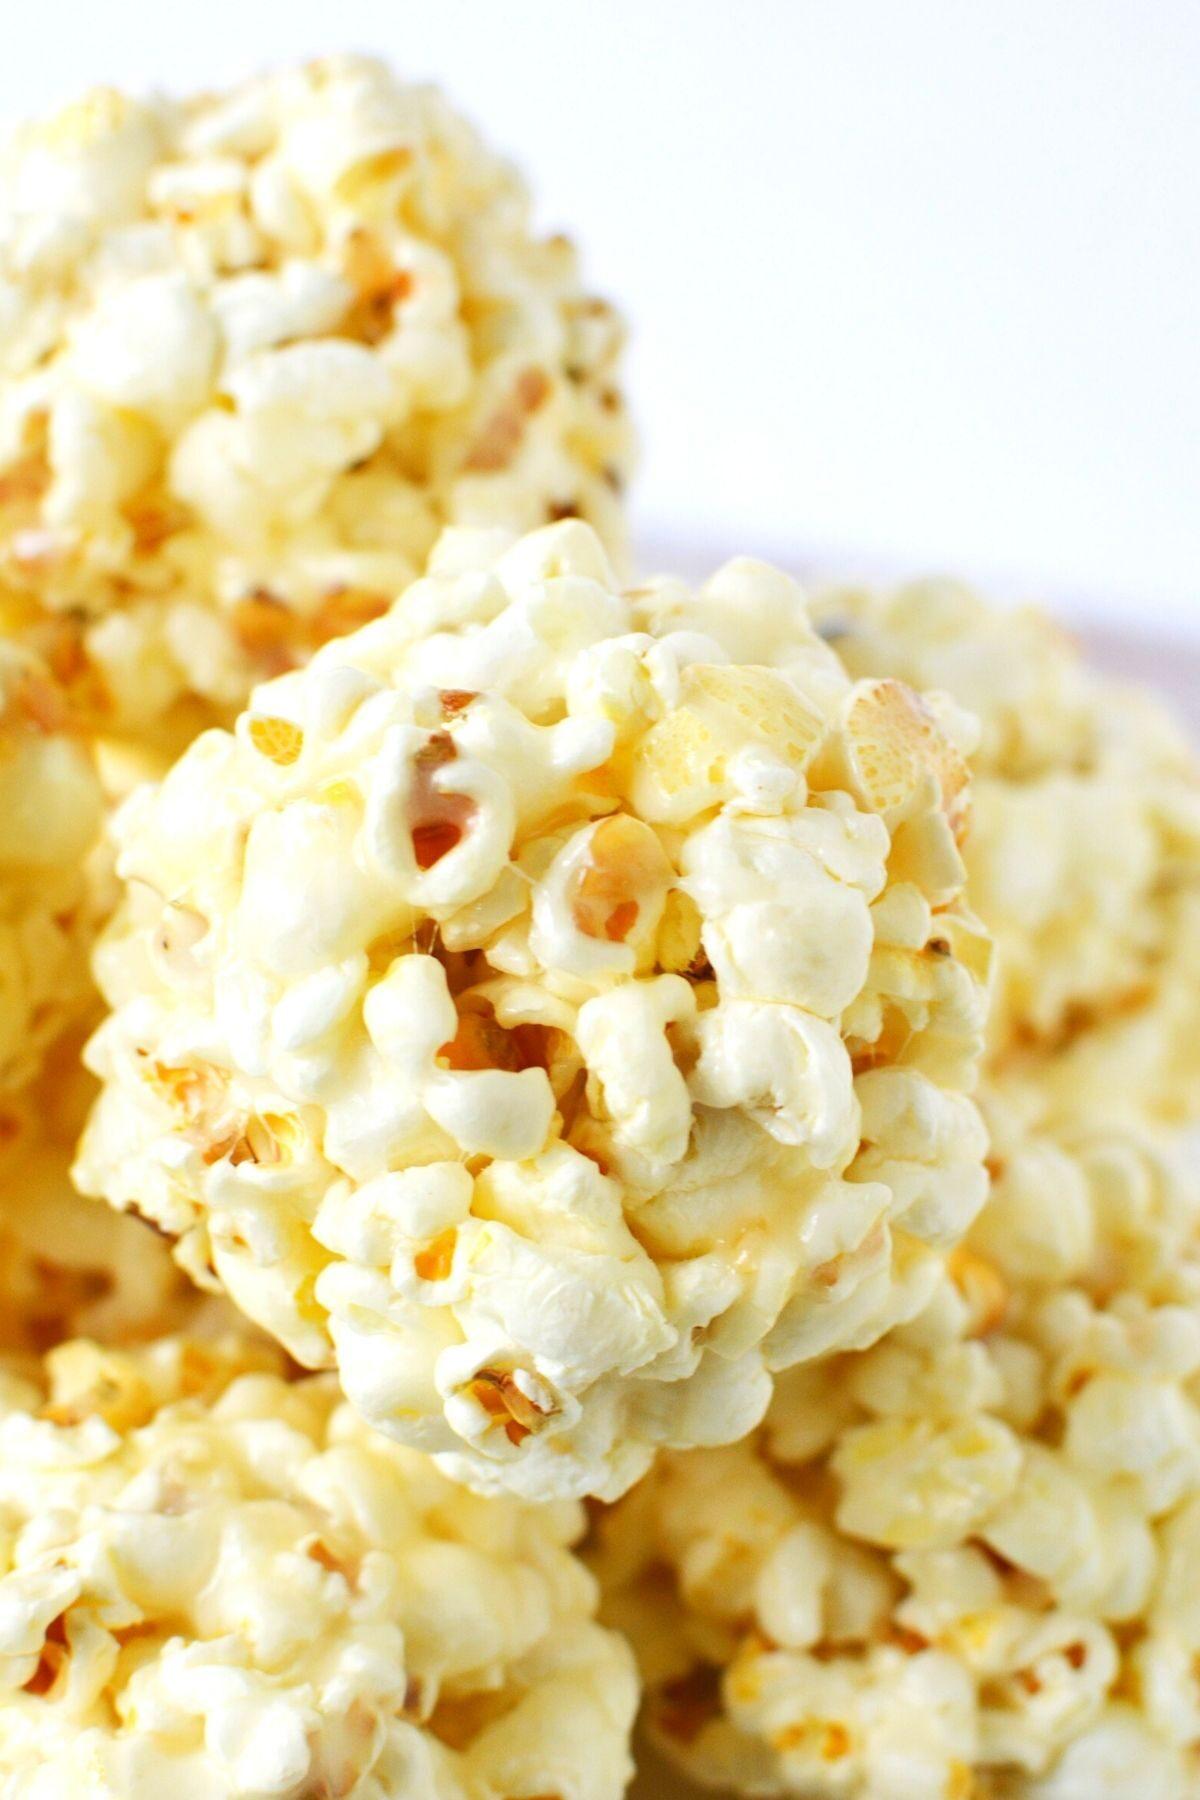 close up of popcorn balls.